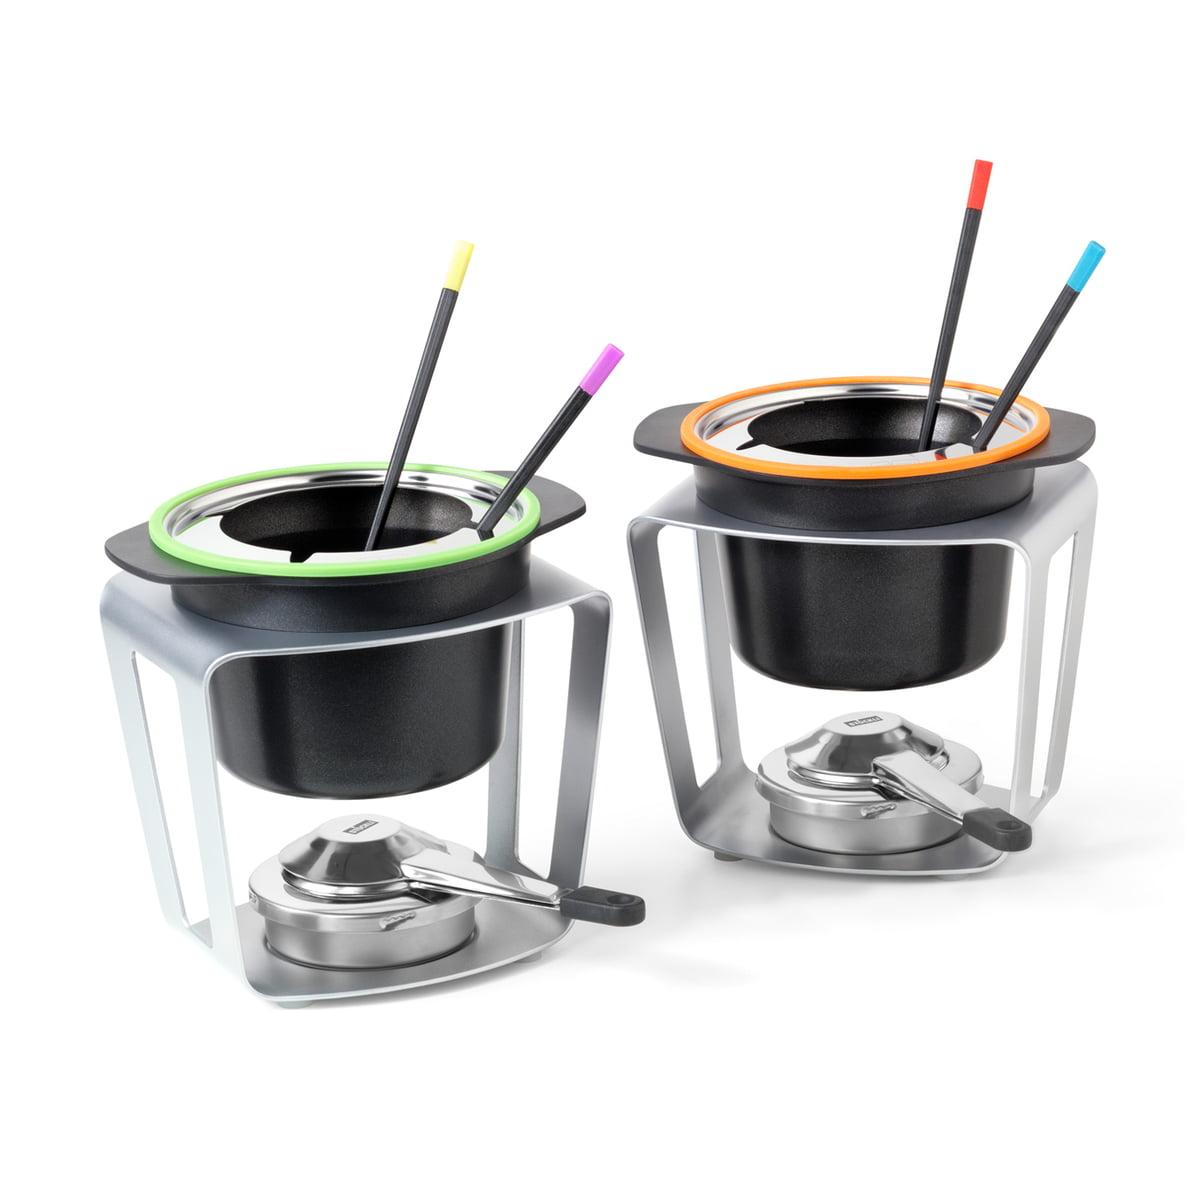 Stöckli - Fondue Fun (2er-Set) | Küche und Esszimmer > Küchengeräte > Fondue | Schwarz | Aluguss-topf -  silikonring -  edelstahlrechaud | Stöckli